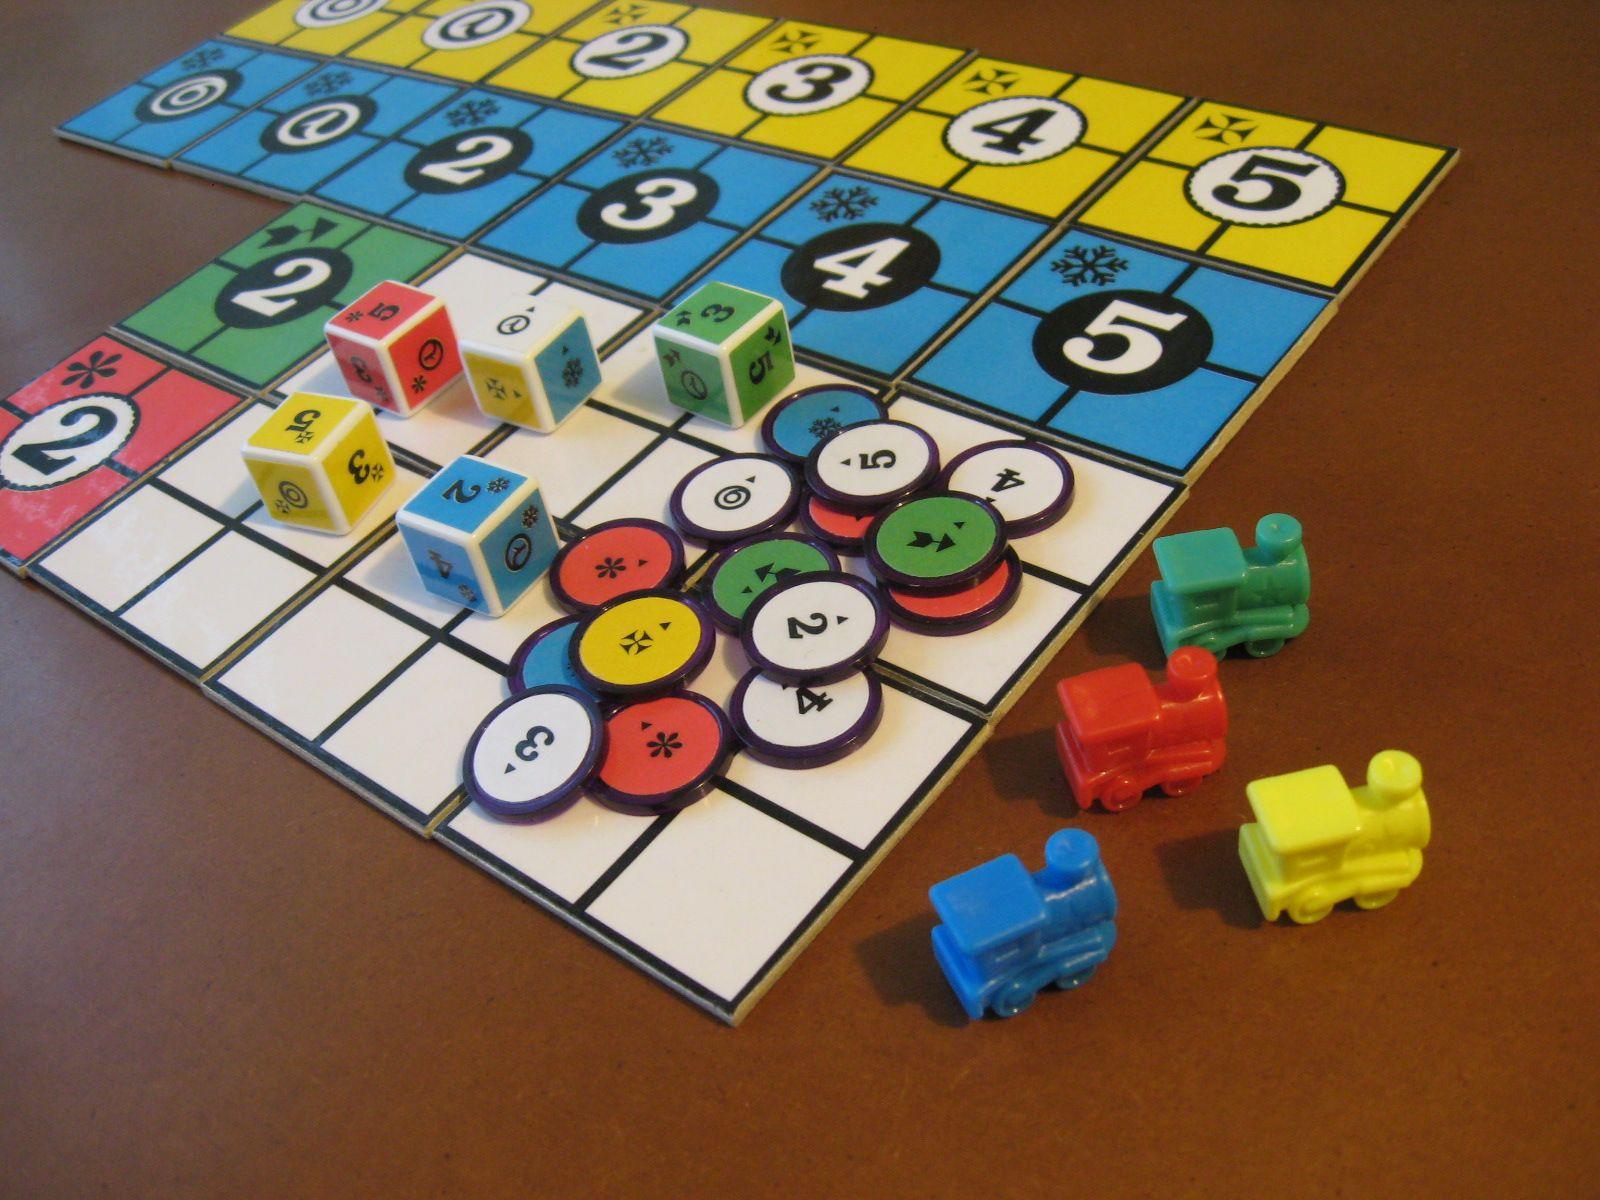 """Homemade PiecePack"" (https://boardgamegeek.com/image/1639074/piecepack) by Daniel Ajoy (https://boardgamegeek.com/user/DanielAjoy) / ""CC BY-NC-SA 3.0"" (http://creativecommons.org/licenses/by-nc-sa/3.0)."